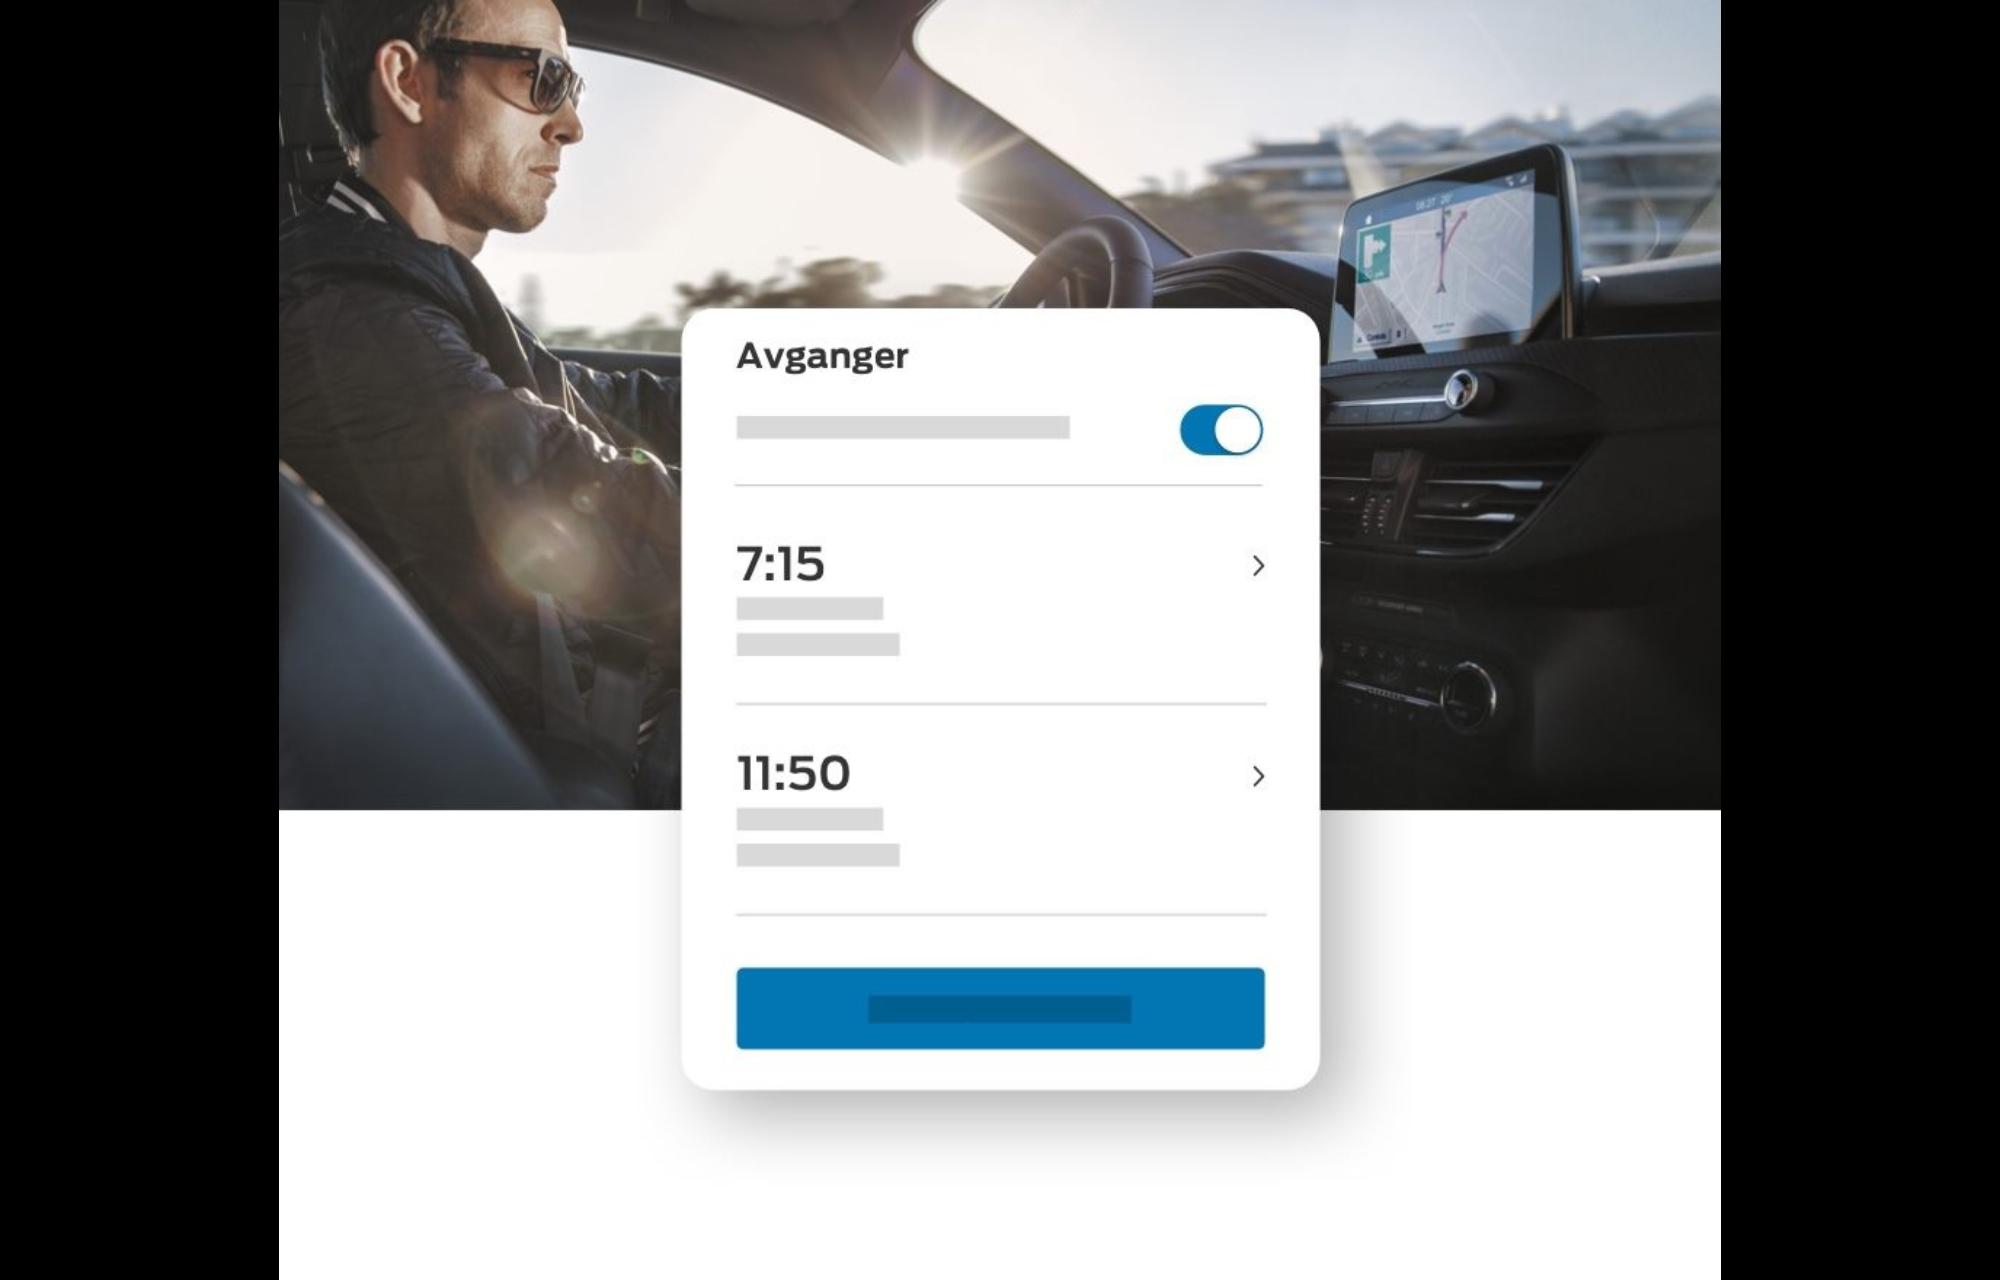 FordPass traffic updates